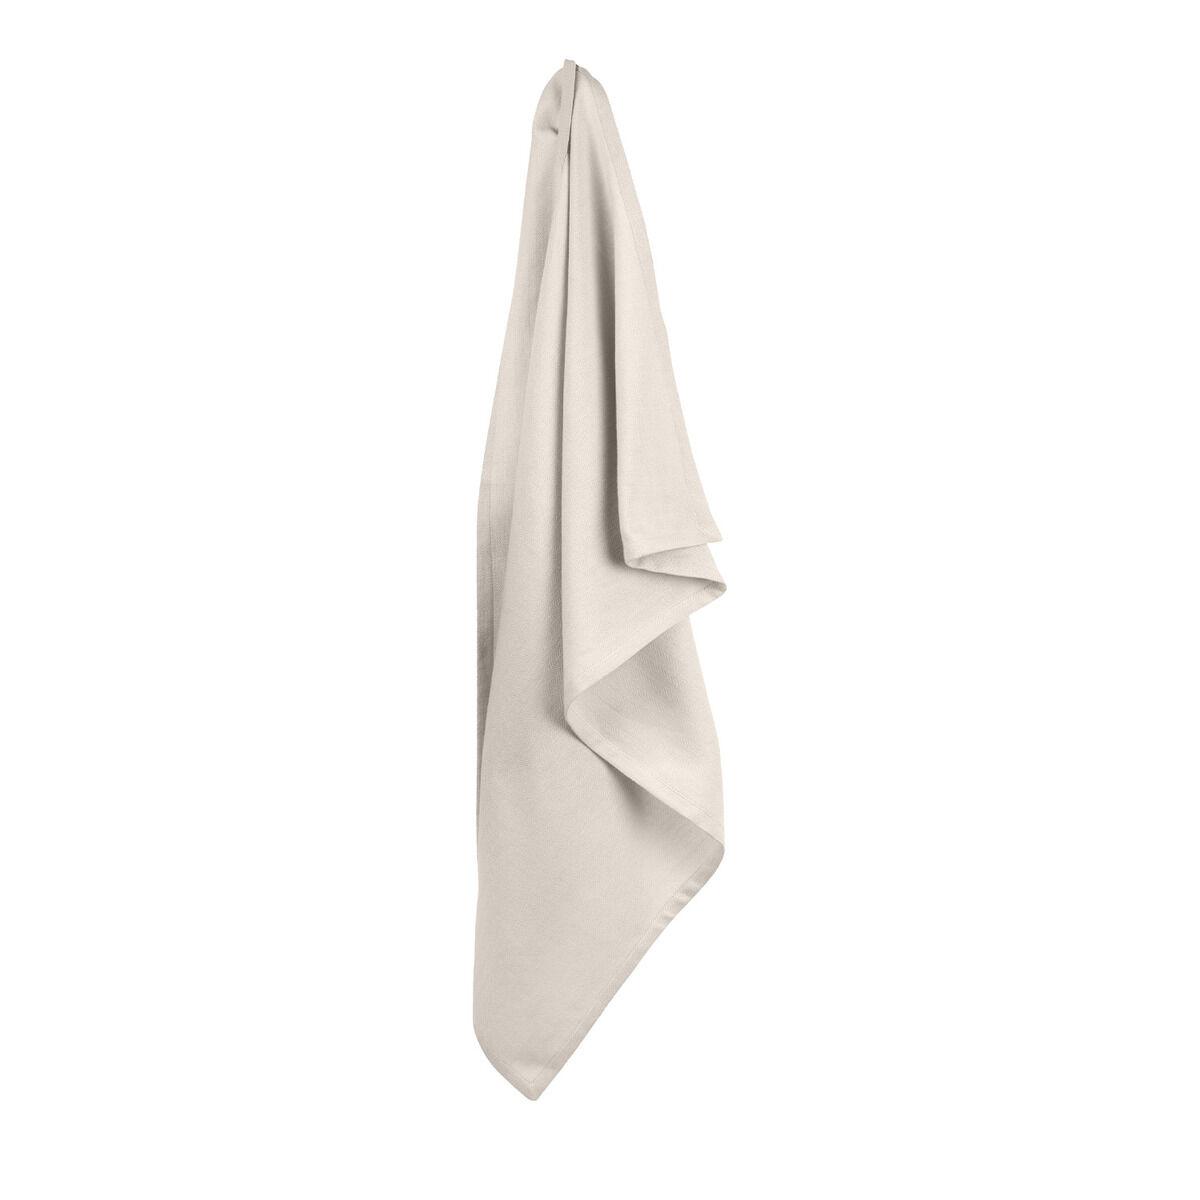 The Organic Company Kitchen towel, stone